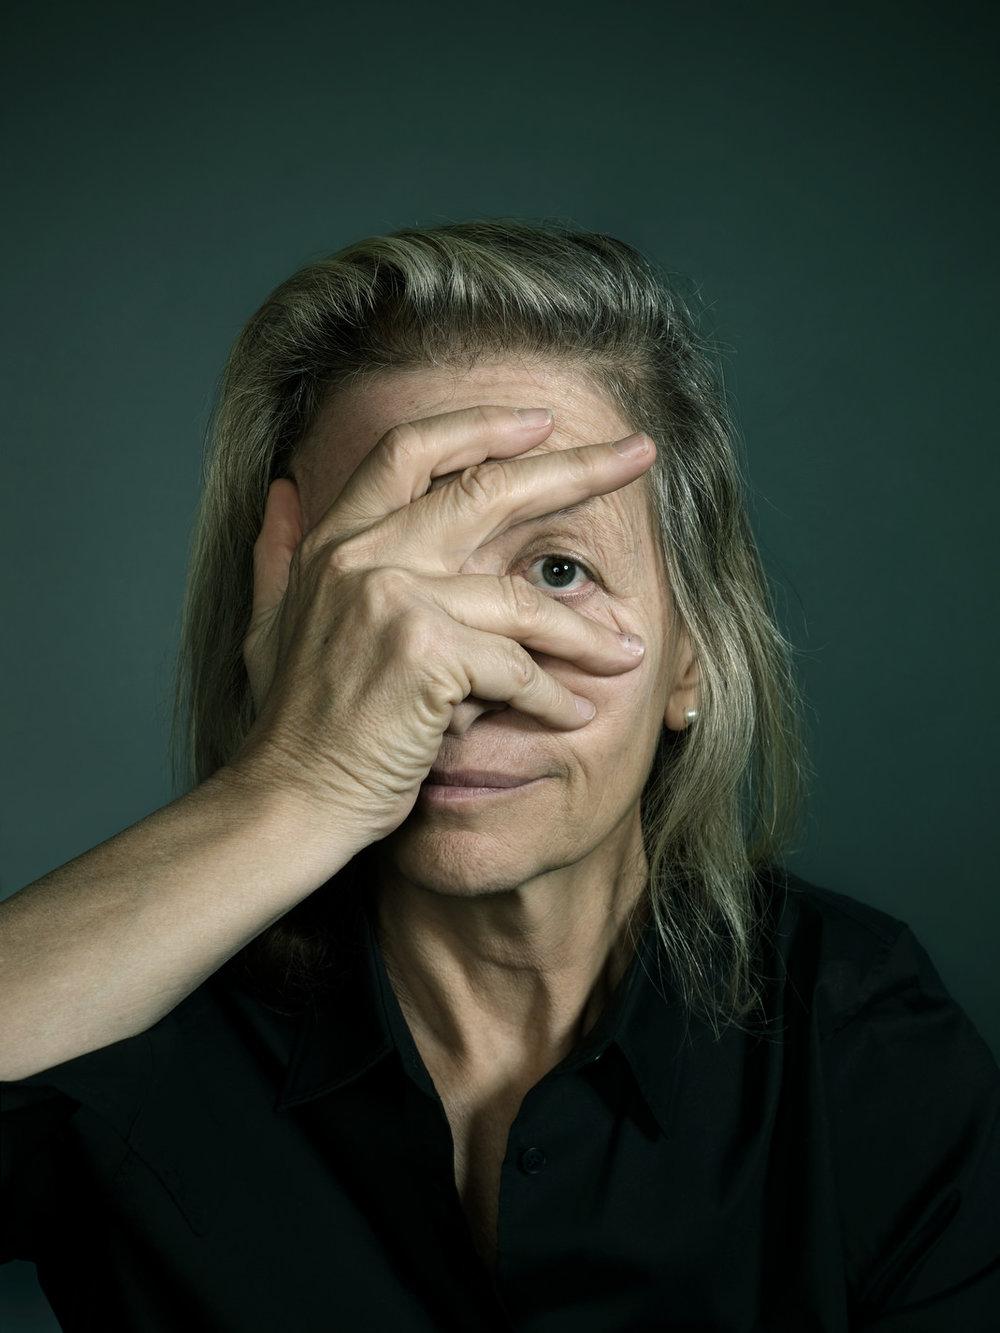 Annie Leibovitz portrait by John Keatley